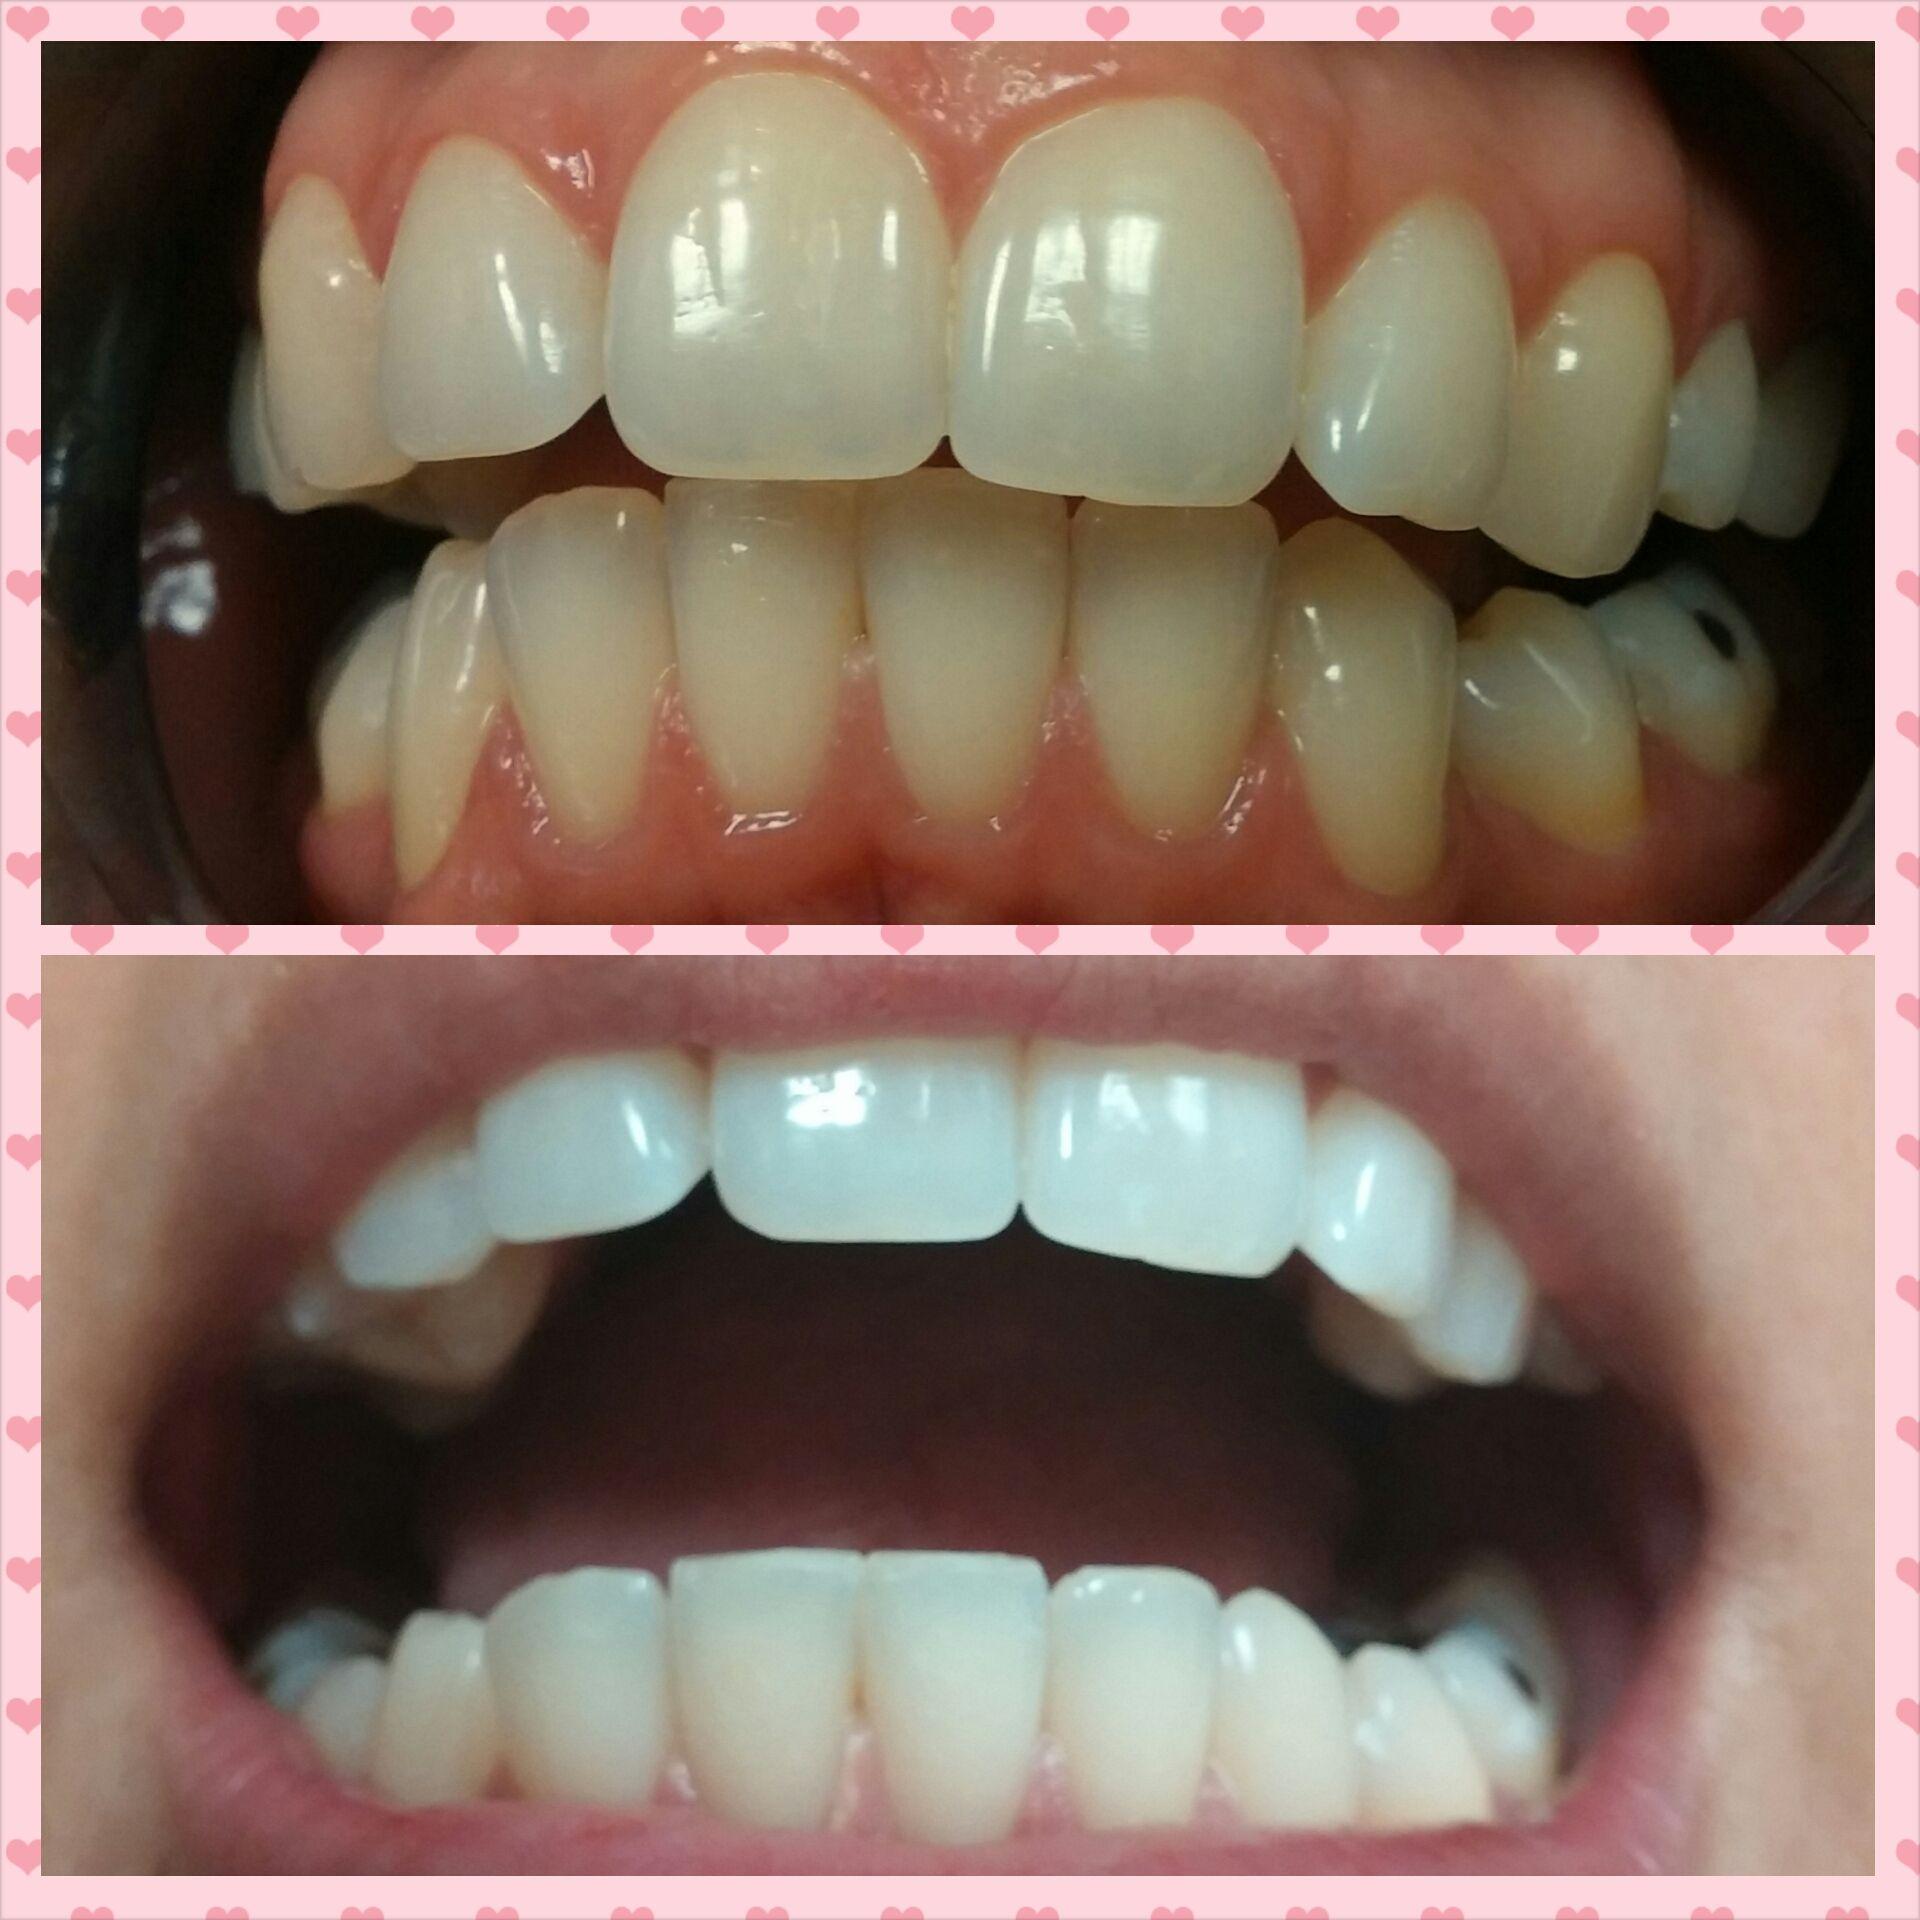 Colgate teeth whitening teeth whitening products pinterest teeth - Led Laser Teeth Whitening Before After